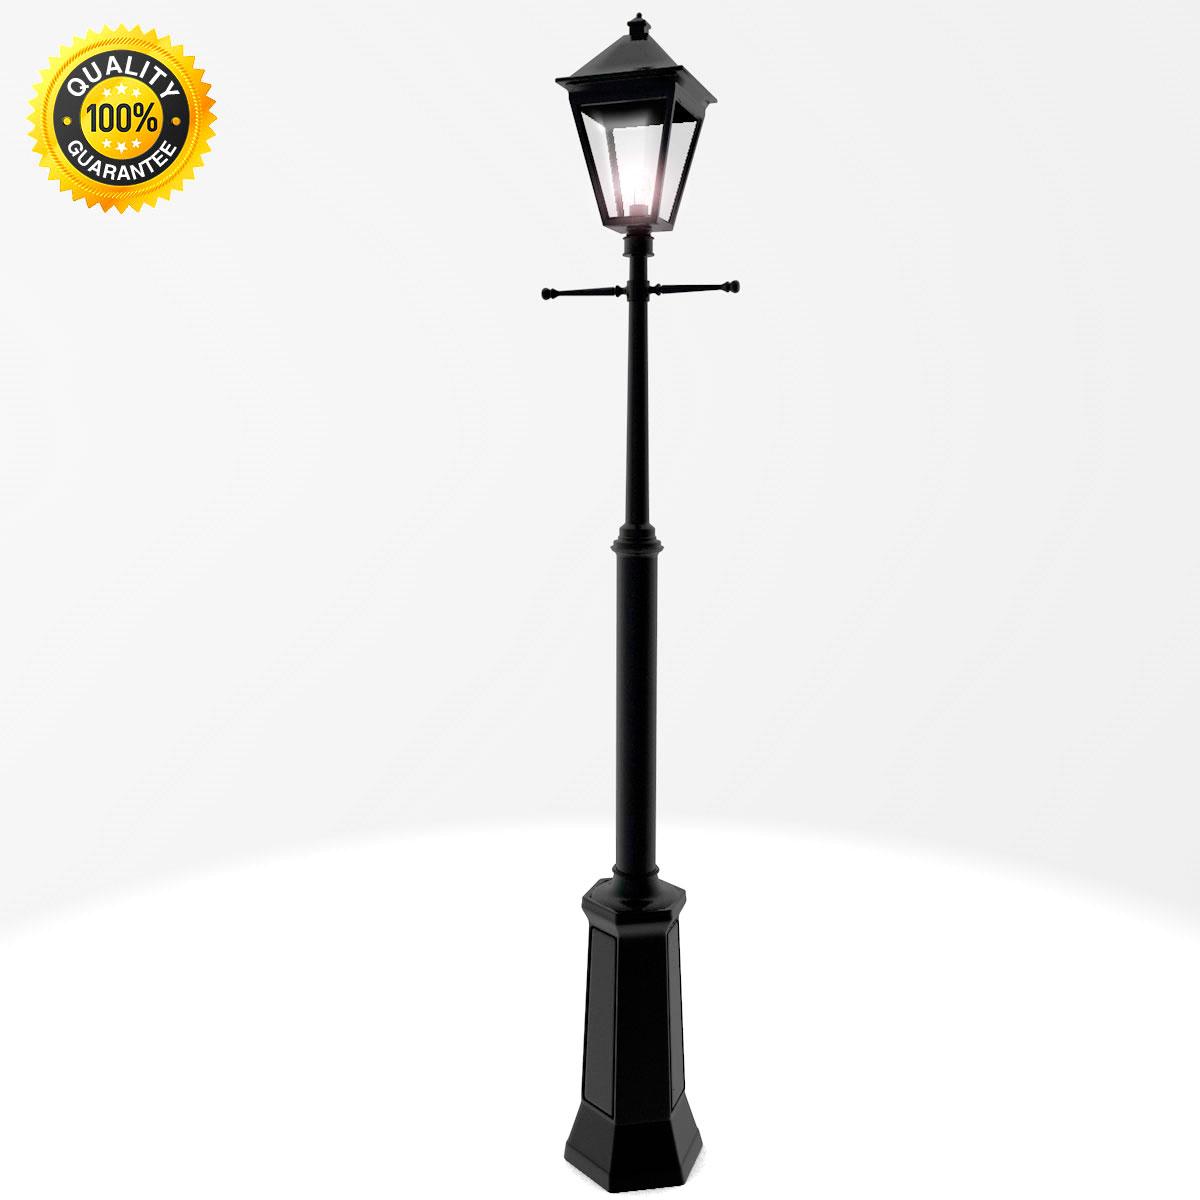 London Classic Post Street Lamp Light c3j5AqL4R